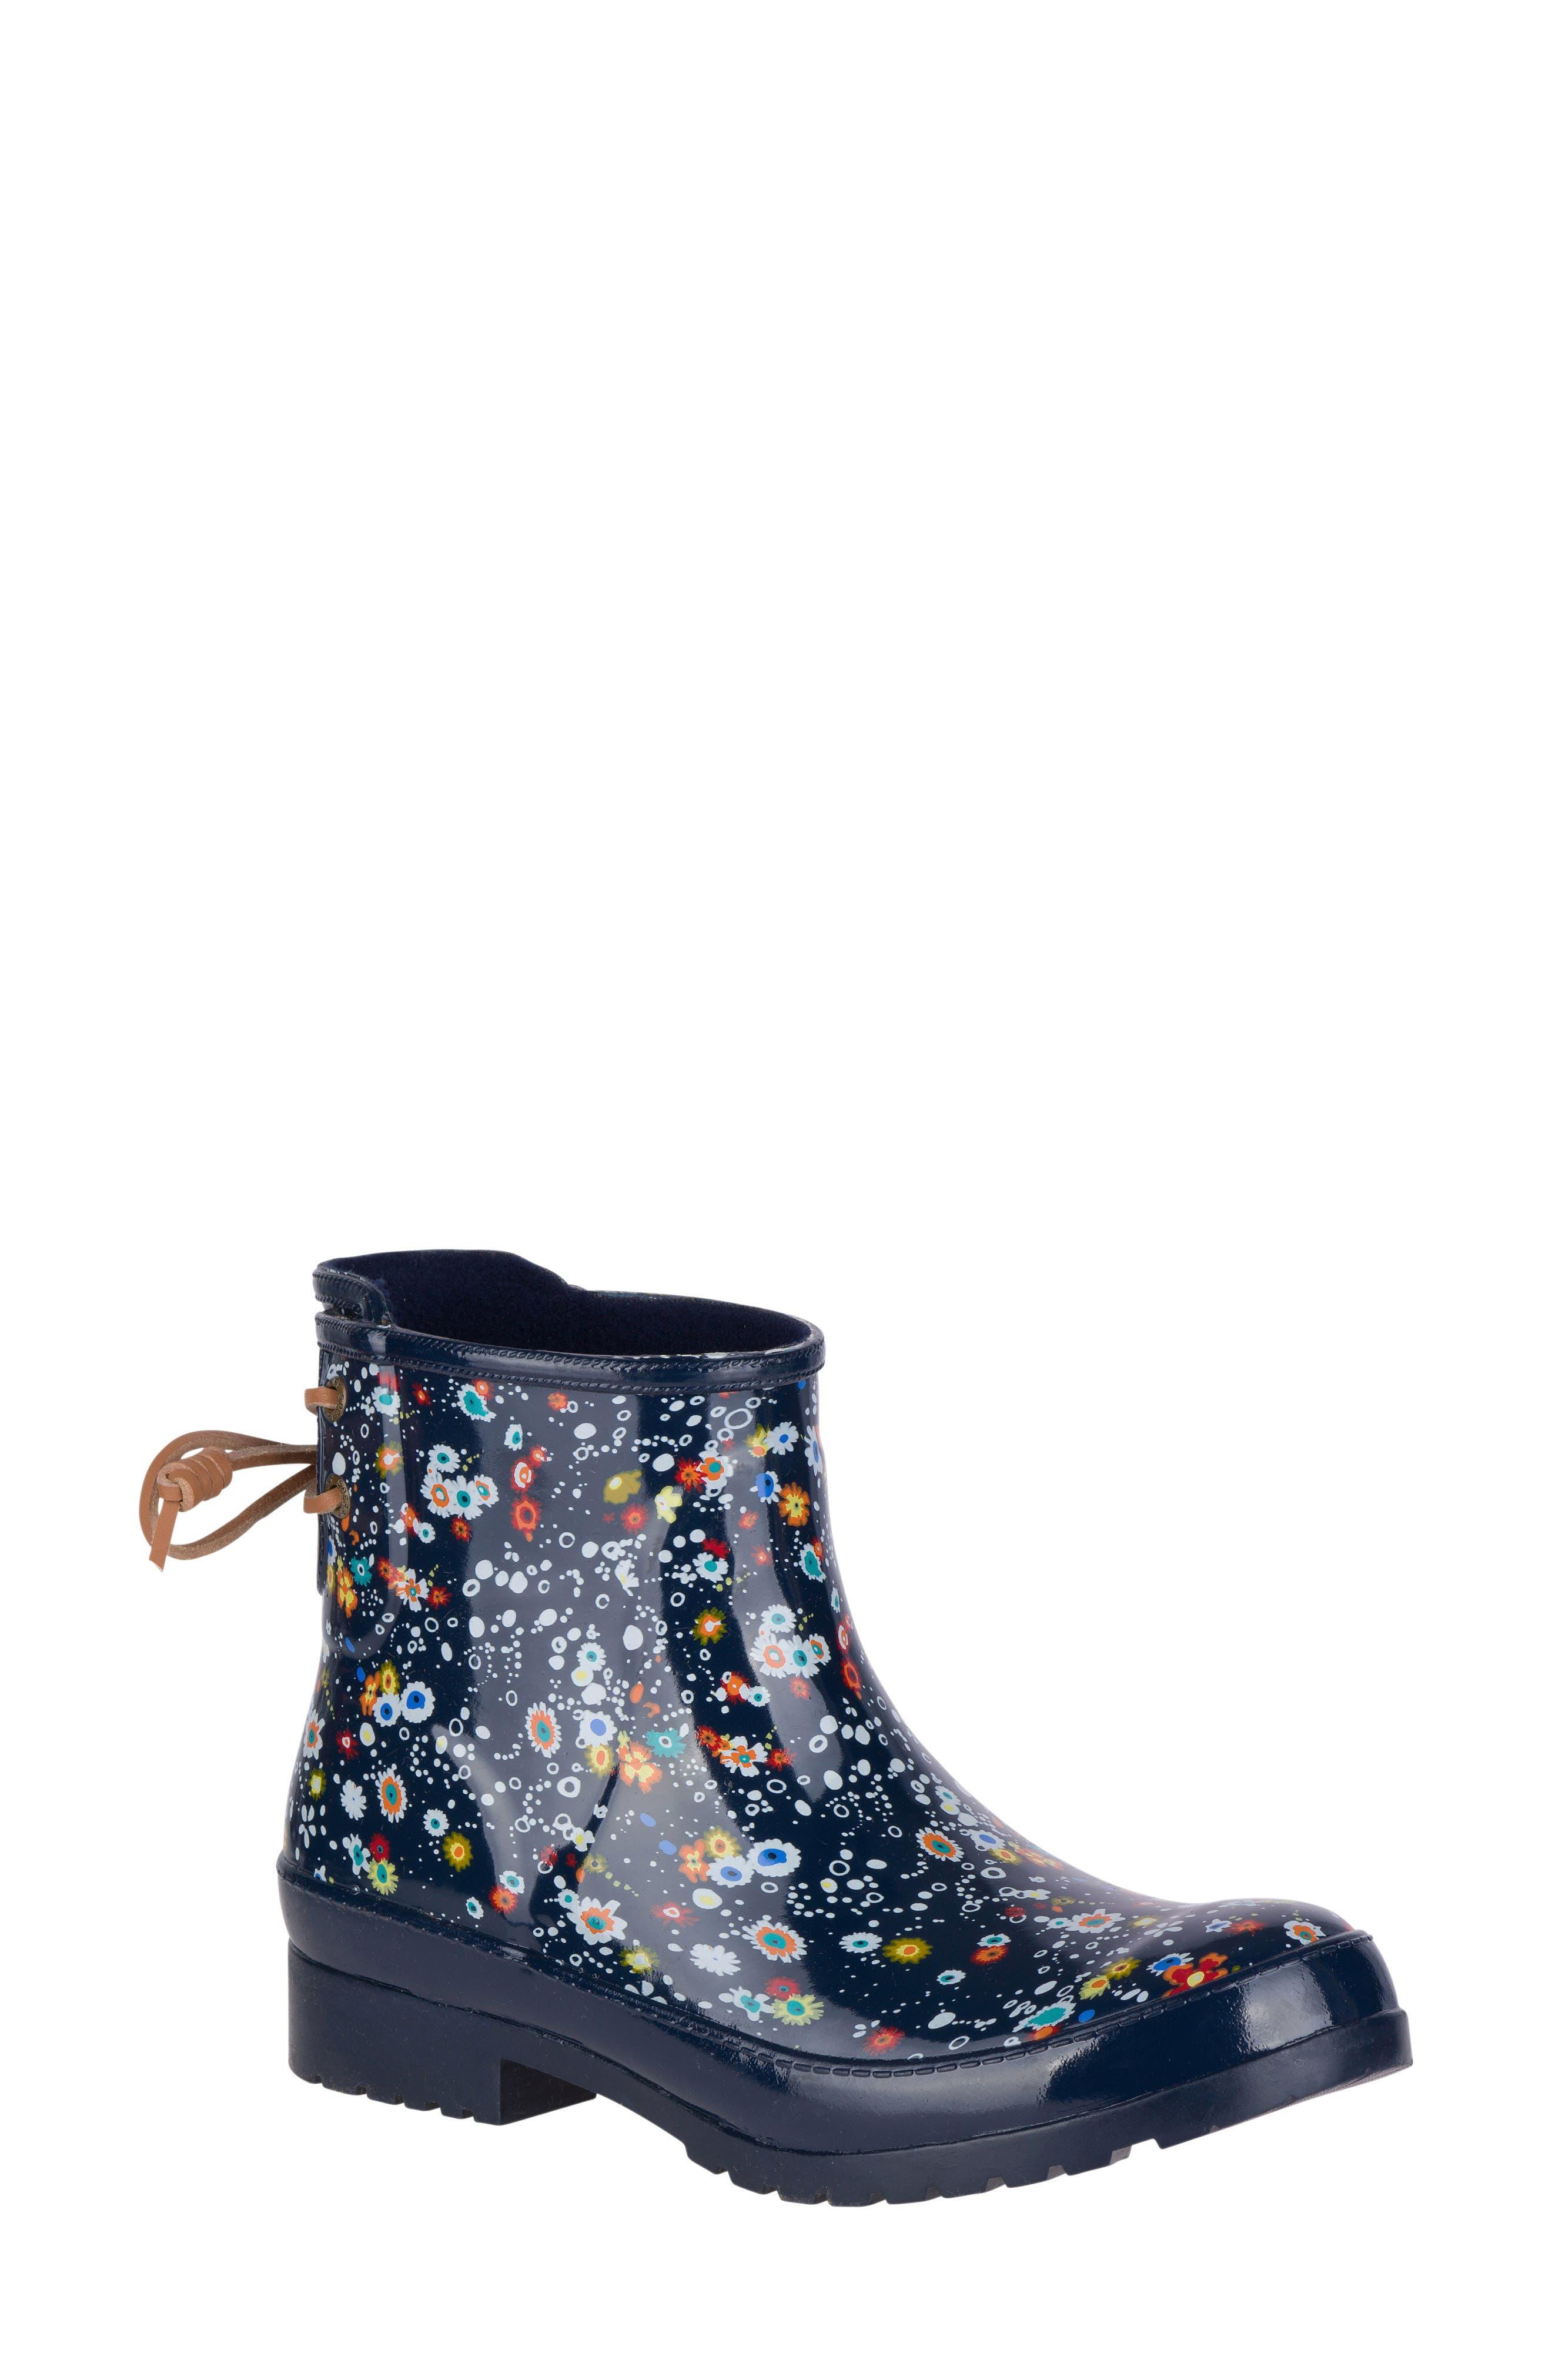 Main Image - Sperry Walker Rain Boot (Women)